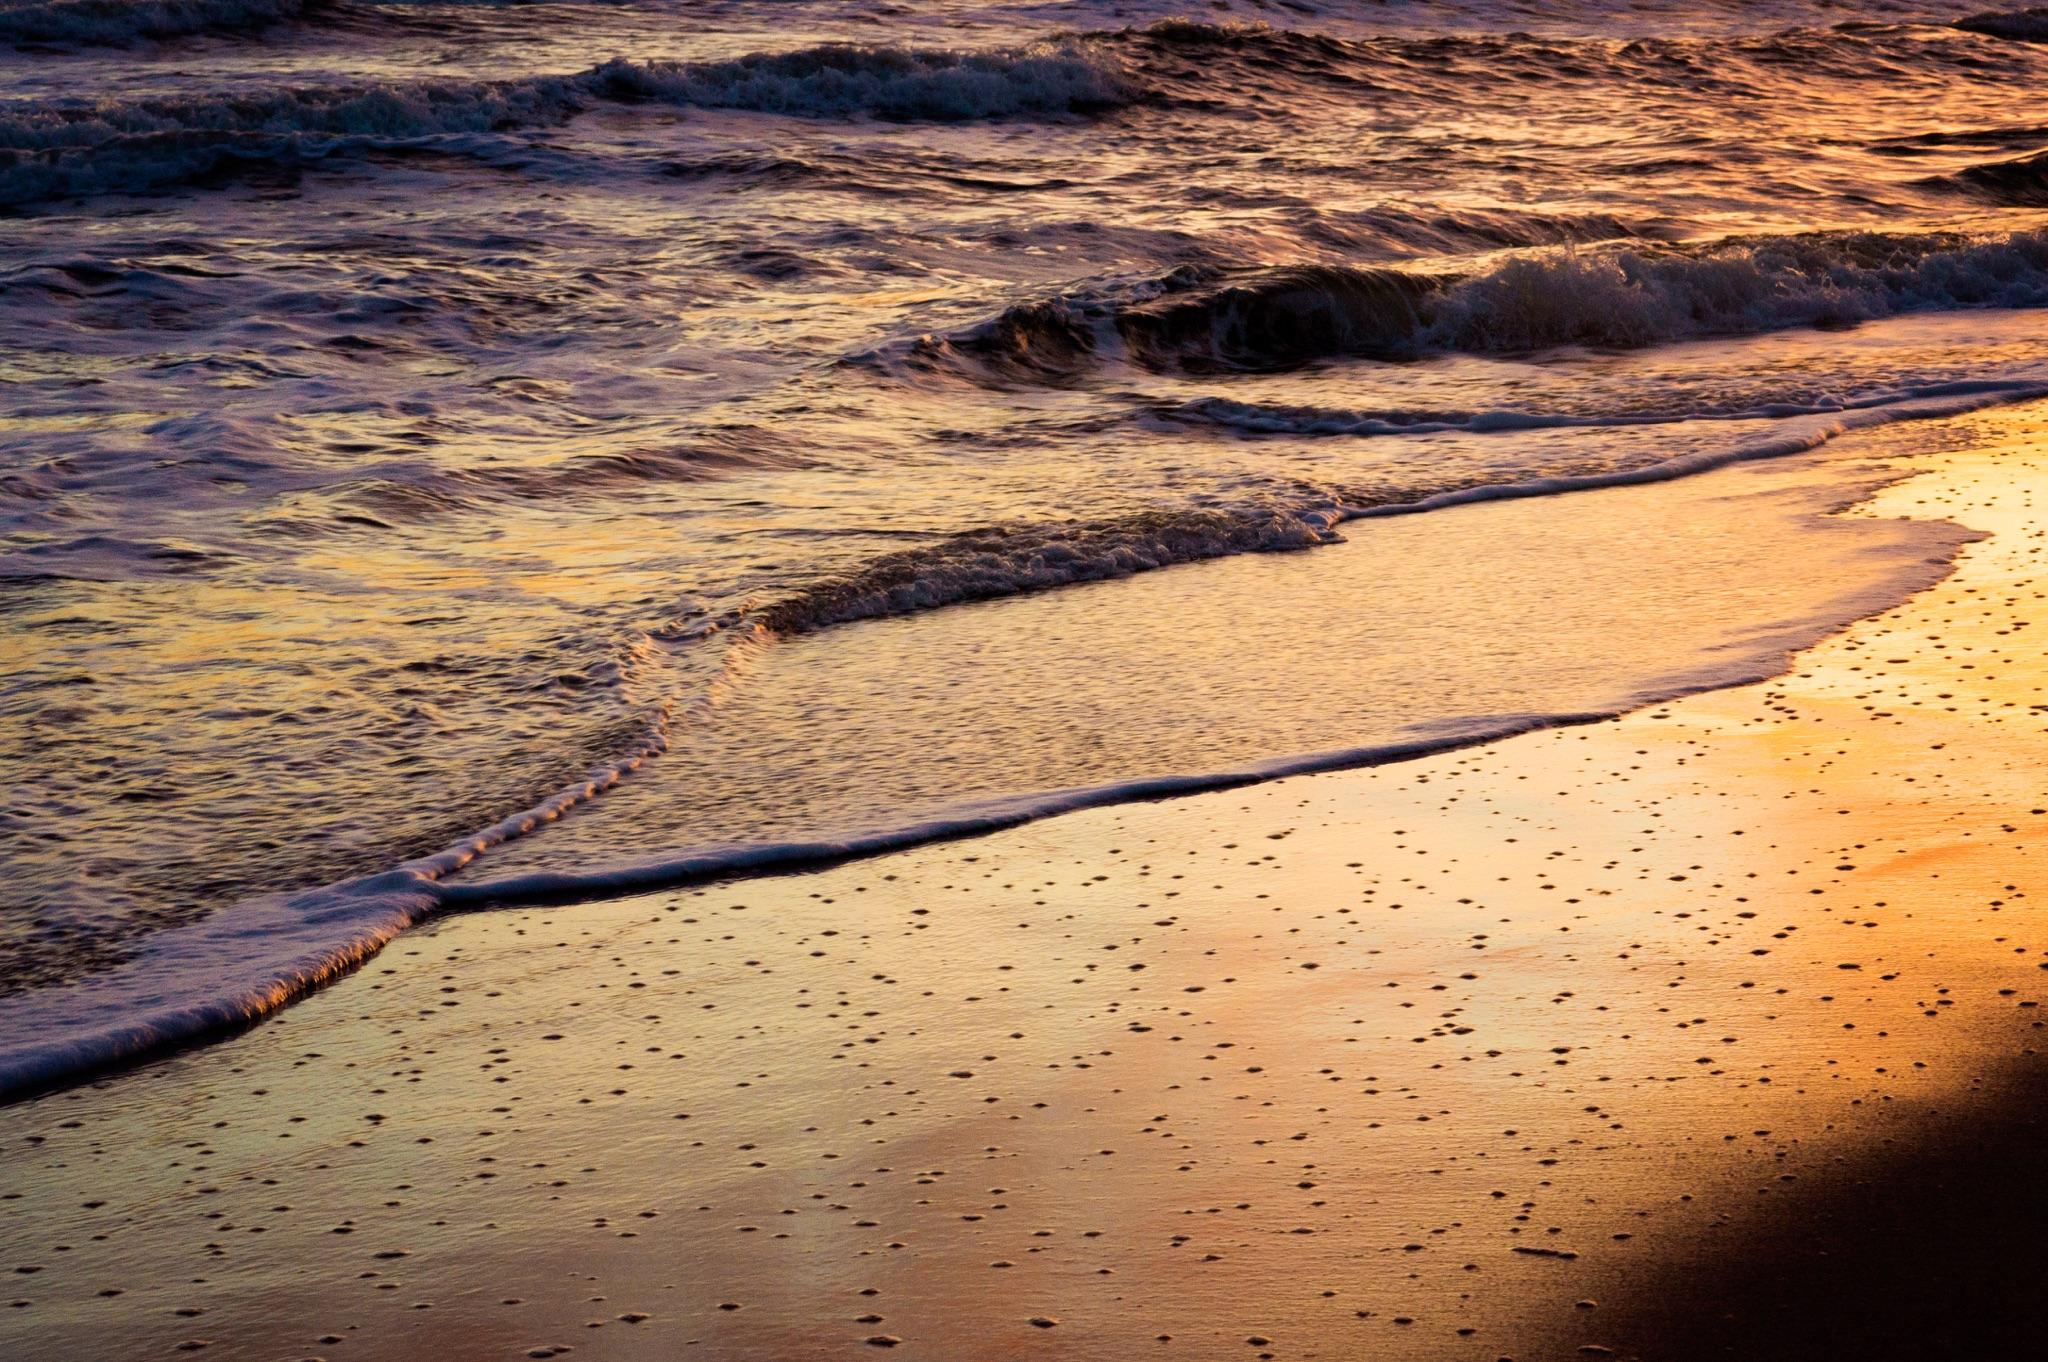 colleen_putman_winter_waves_east_hampton_ny